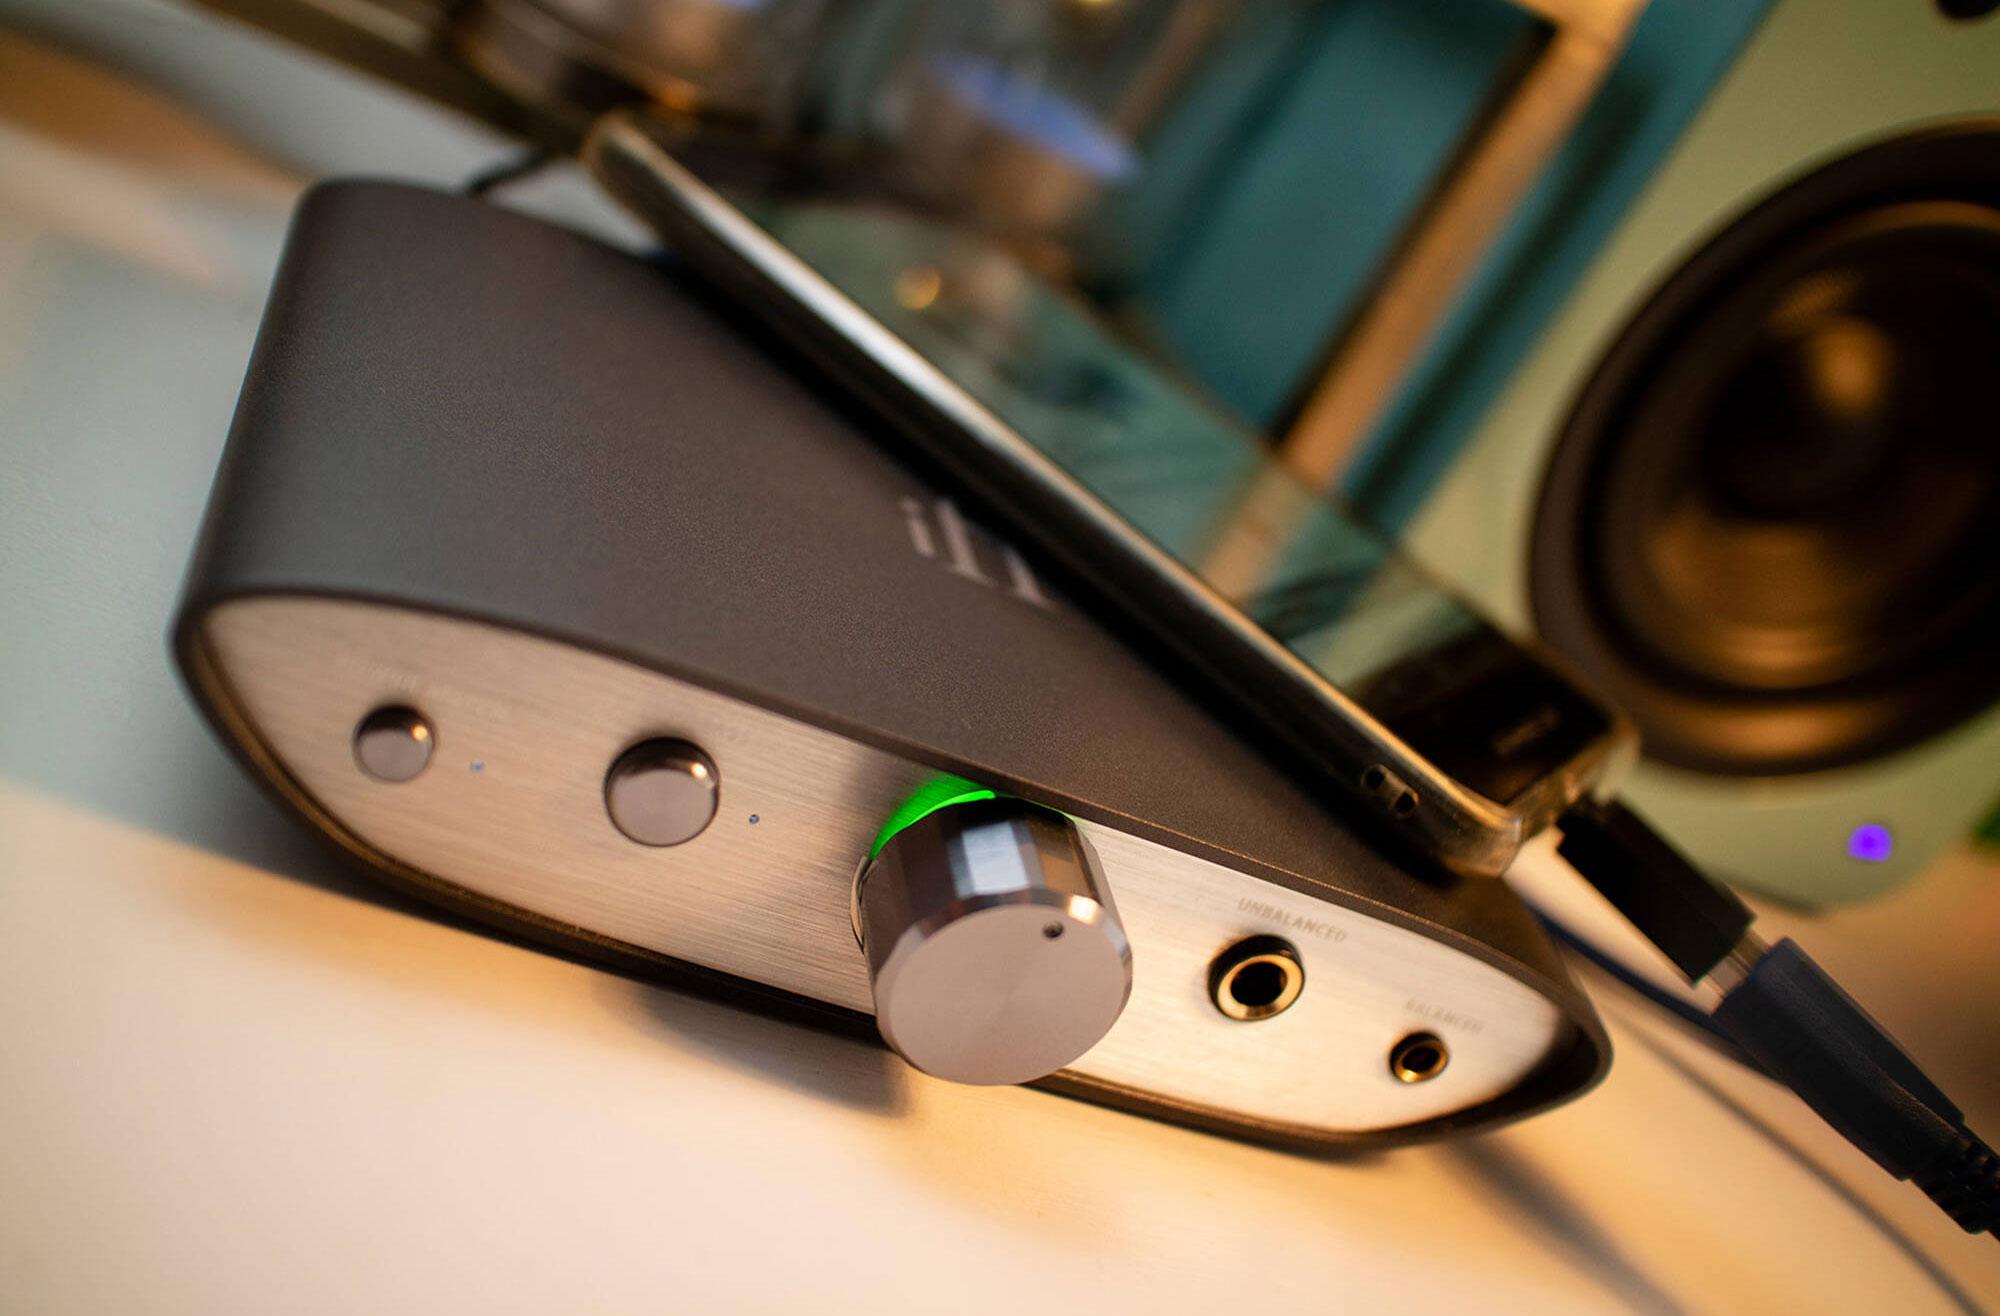 iFi AUDIO Zen DAC V2 Desktop USB DAC and Headphone Amp